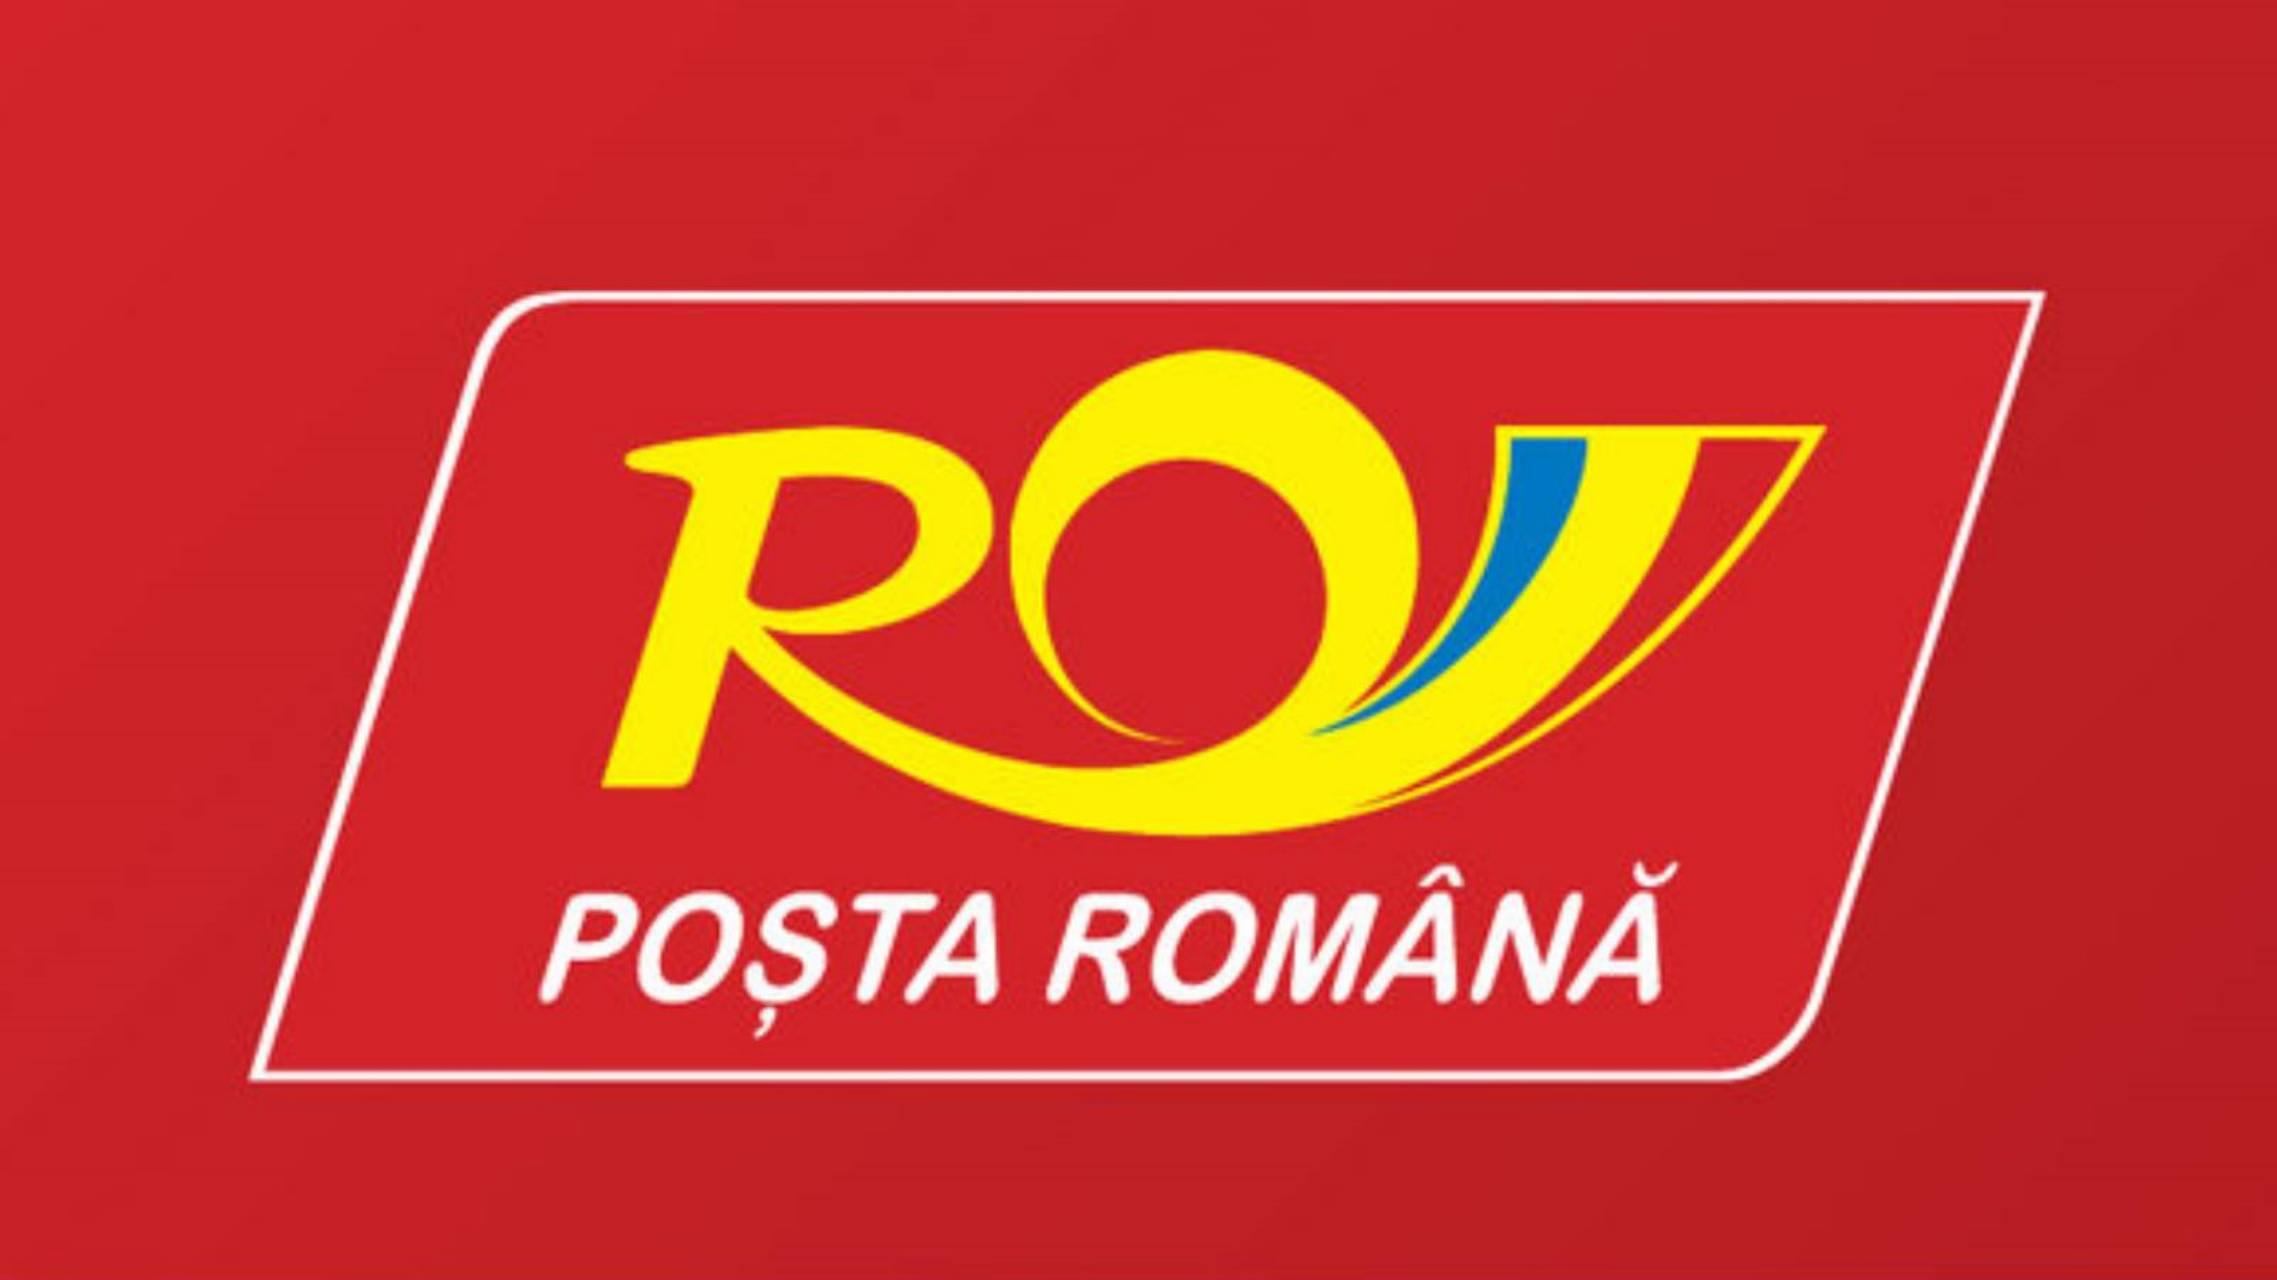 Posta Romana londra